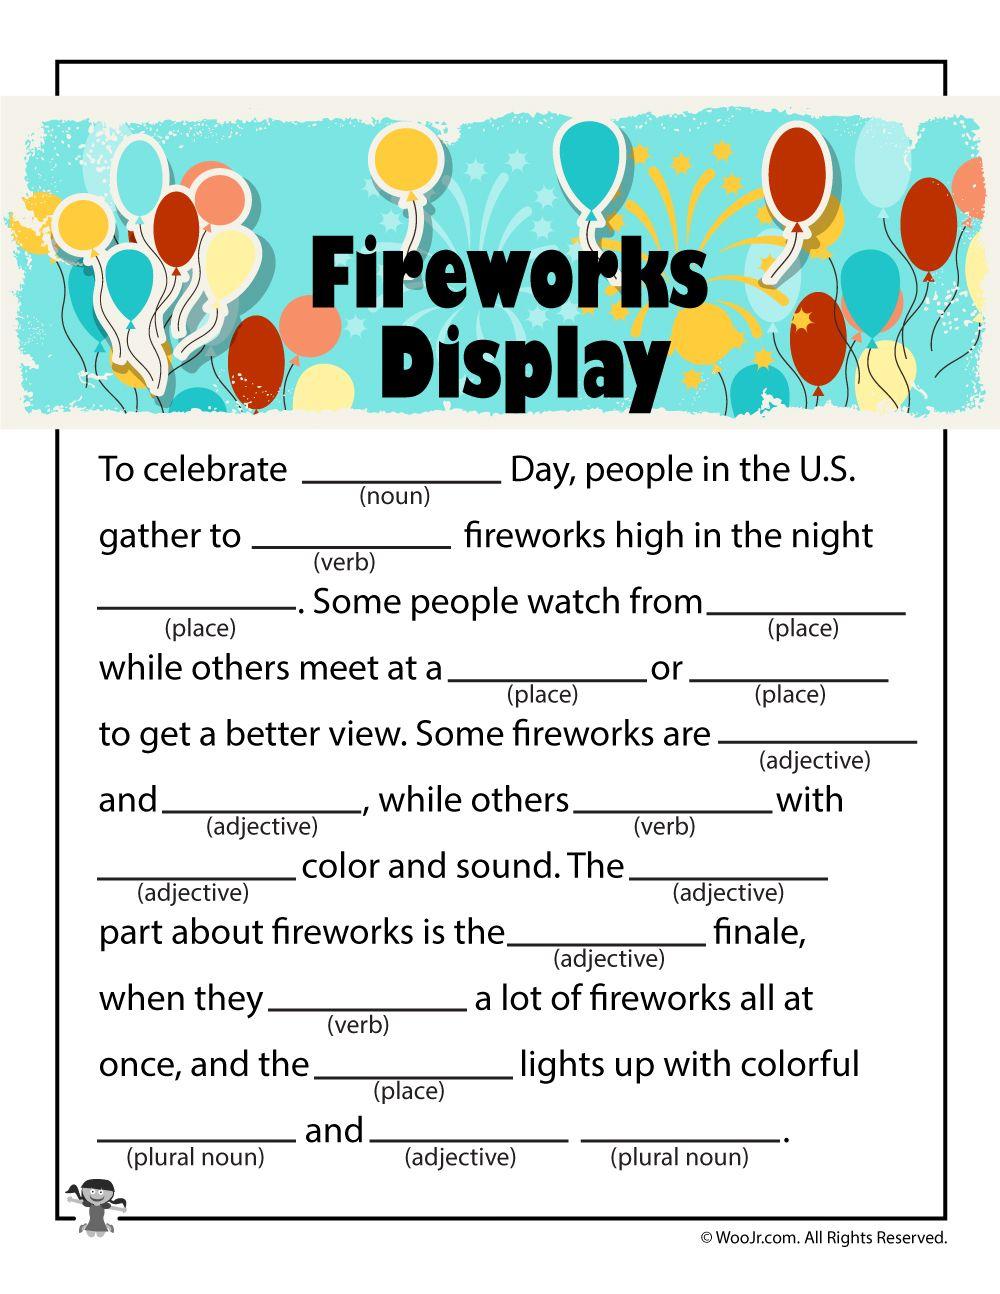 Fireworks Display 4th Of July Mad Libs Woo Jr Kids Activities 4th Of July Games 4th Of July Fourth Of July [ 1294 x 1000 Pixel ]